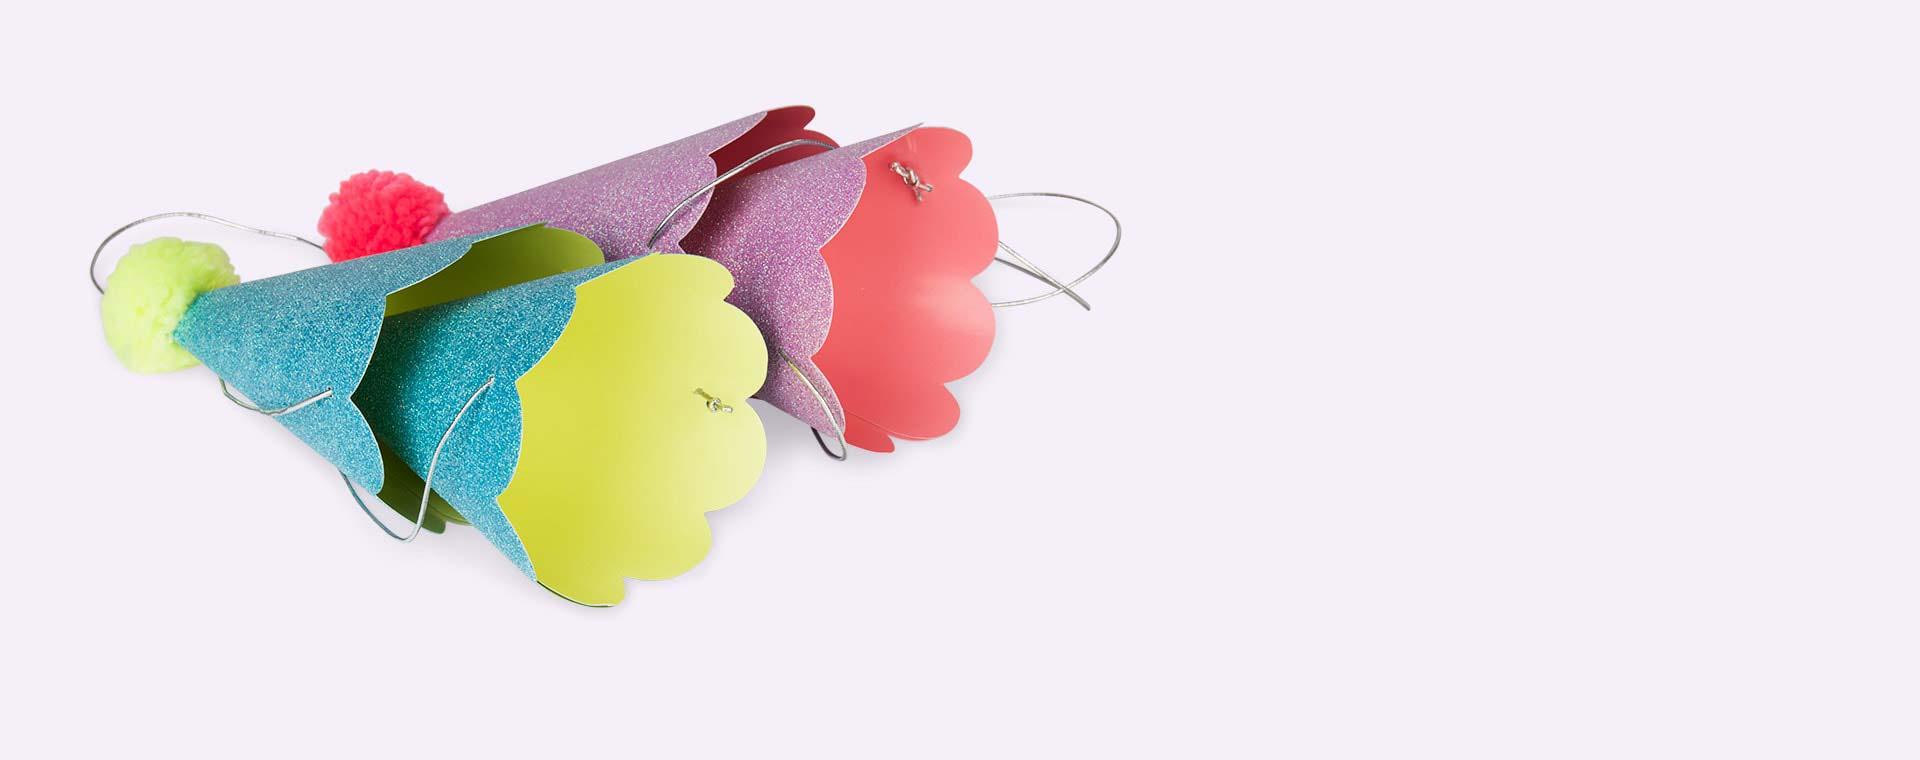 Multi Meri Meri Party Hats with Pom Poms - 8 Pack